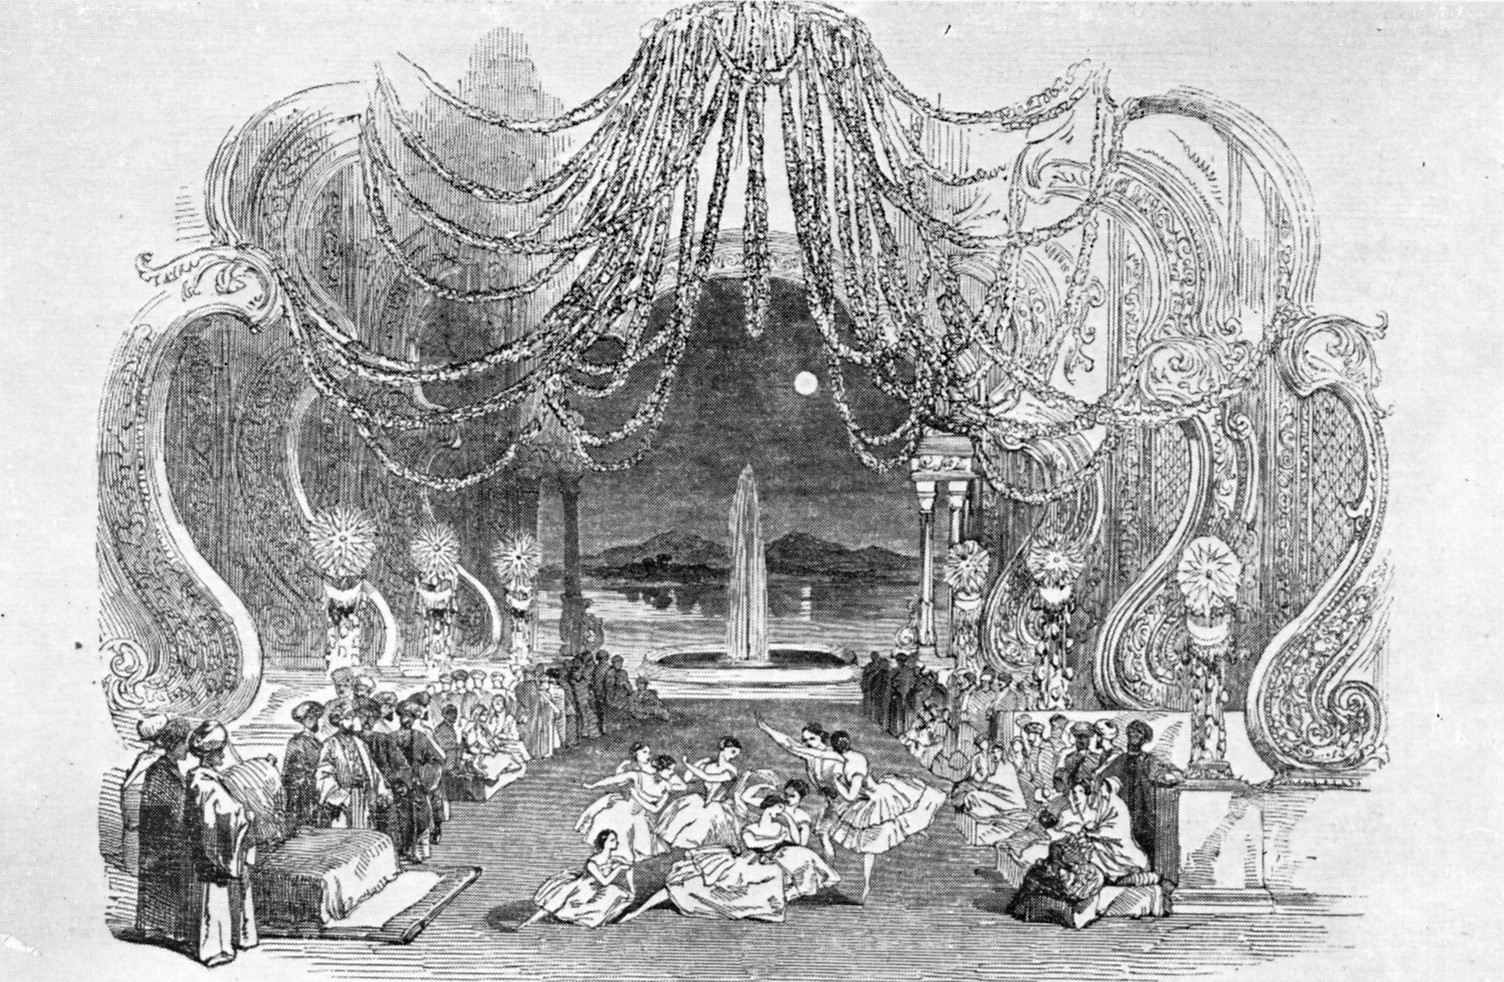 File:Lalla Rookh -Pas Symbolique -London -1846.JPG - Wikipedia, the ...